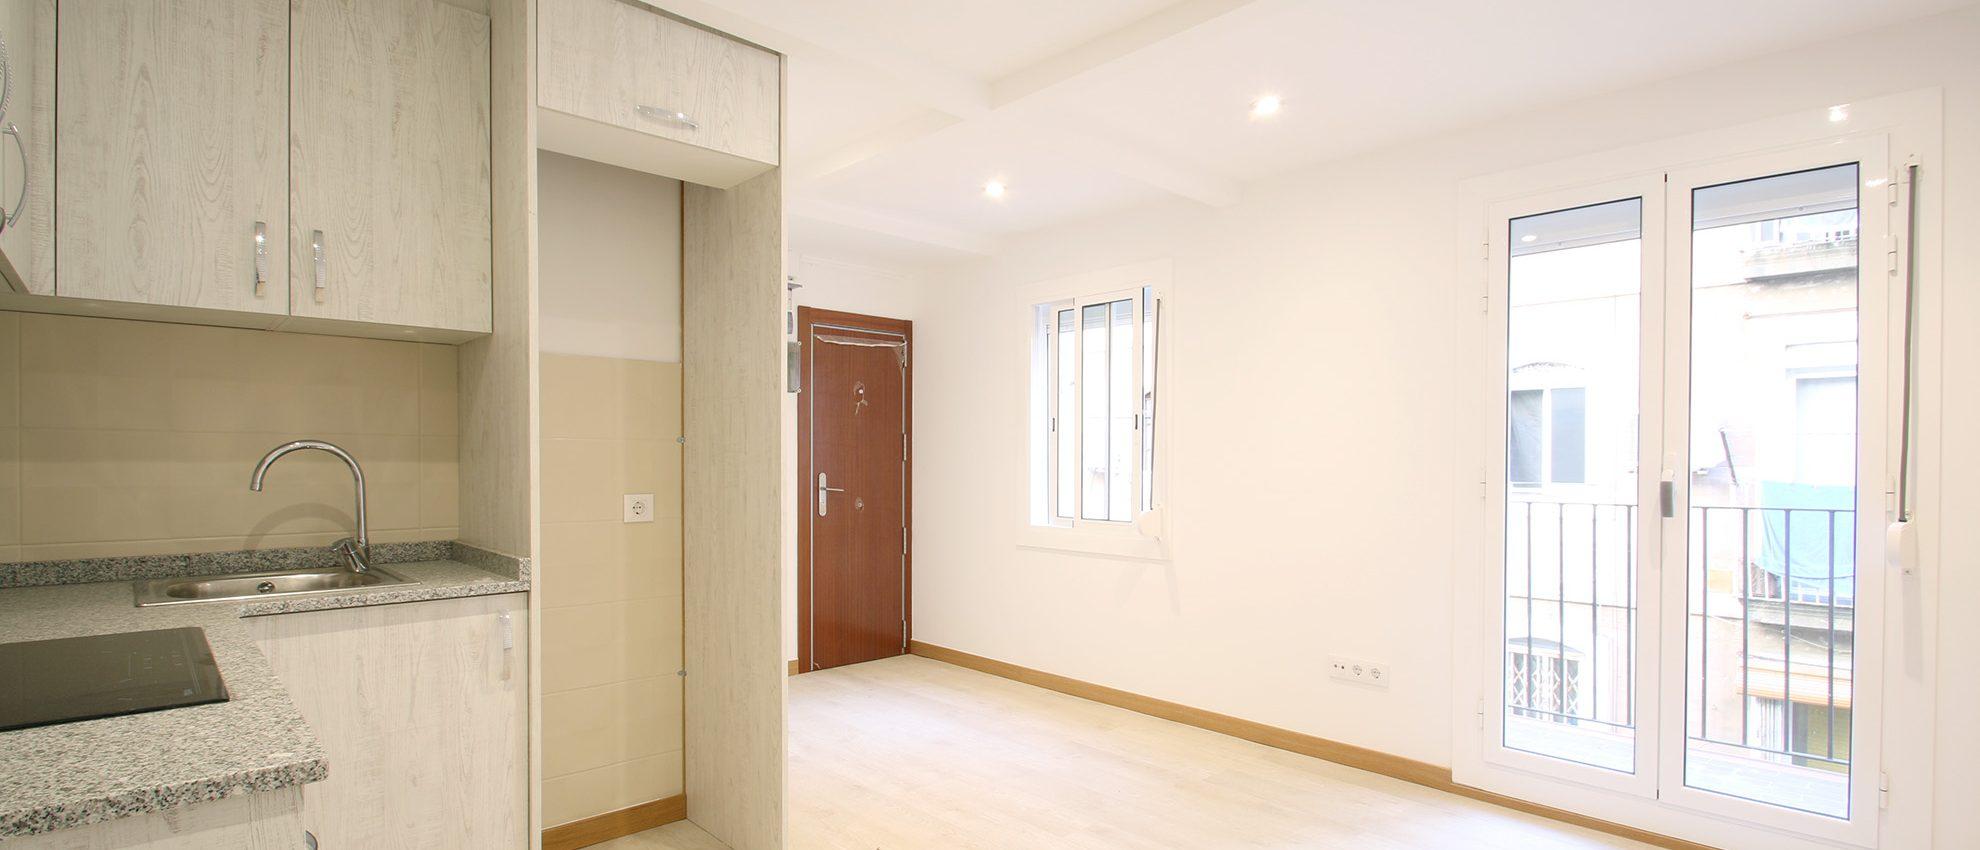 Vila Joiosa 6 apartment